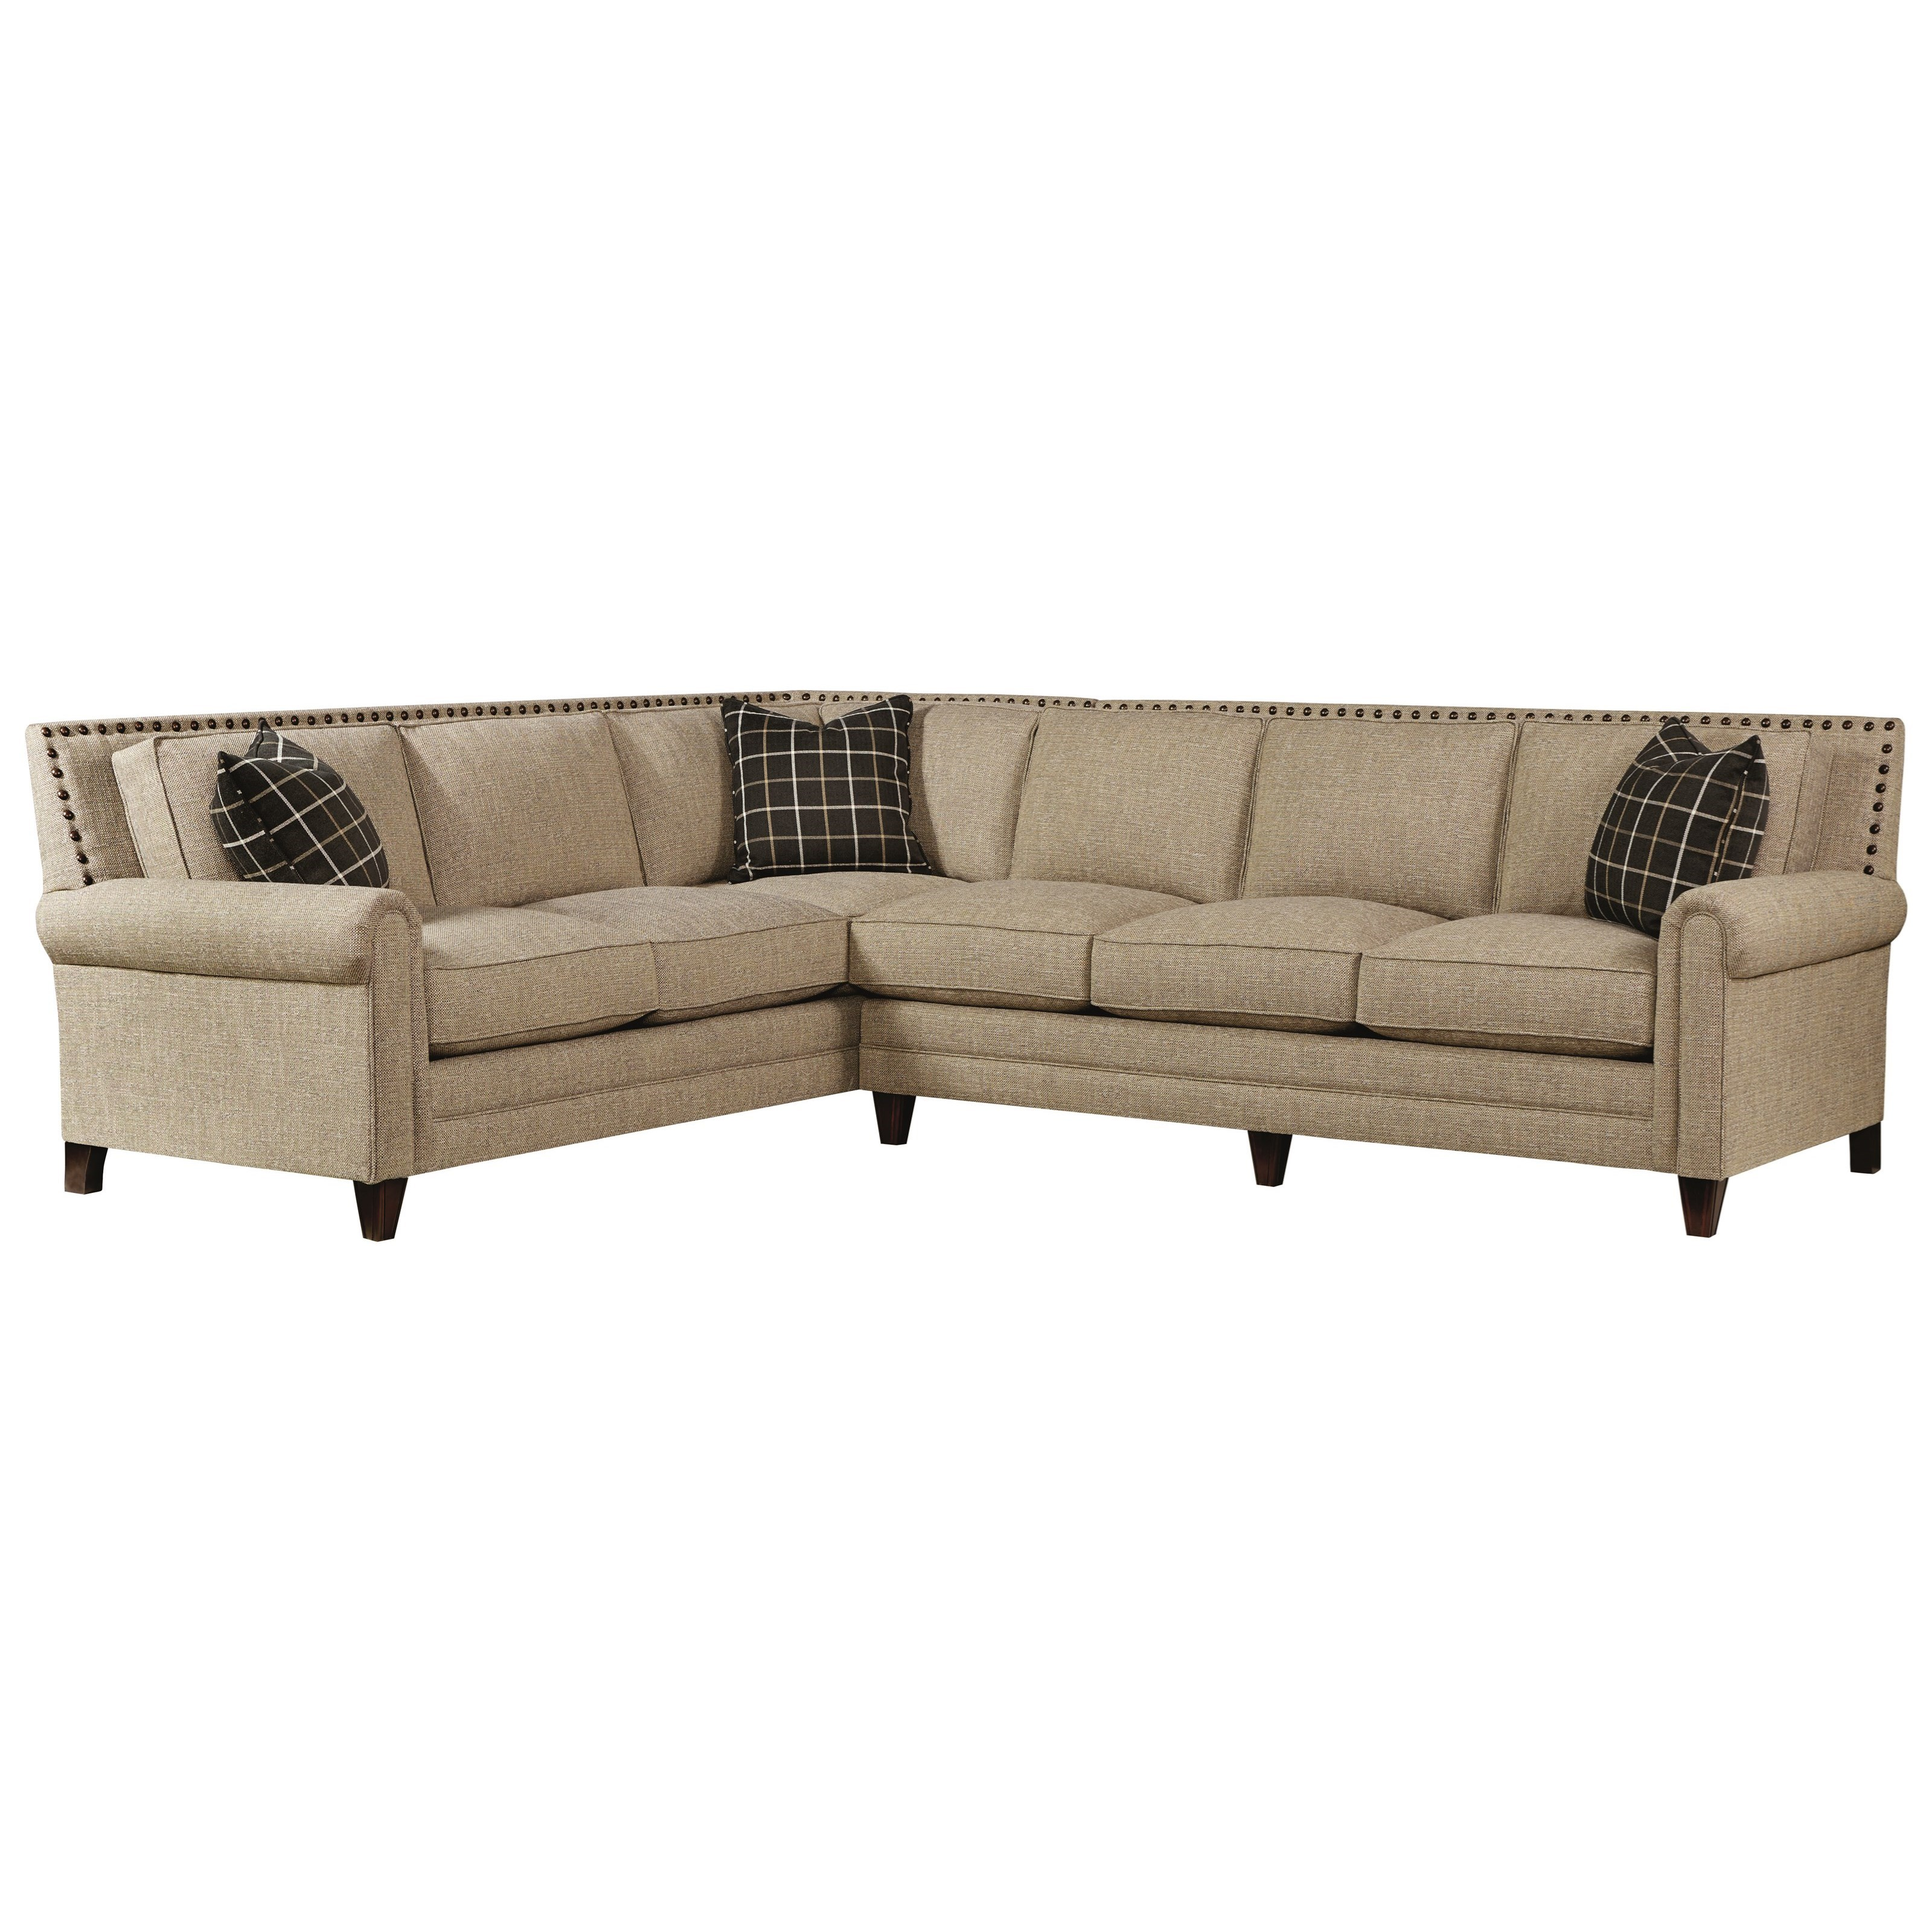 Bassett harlan sectional sofa with 5 seats virginia for Sectional sofas bassett